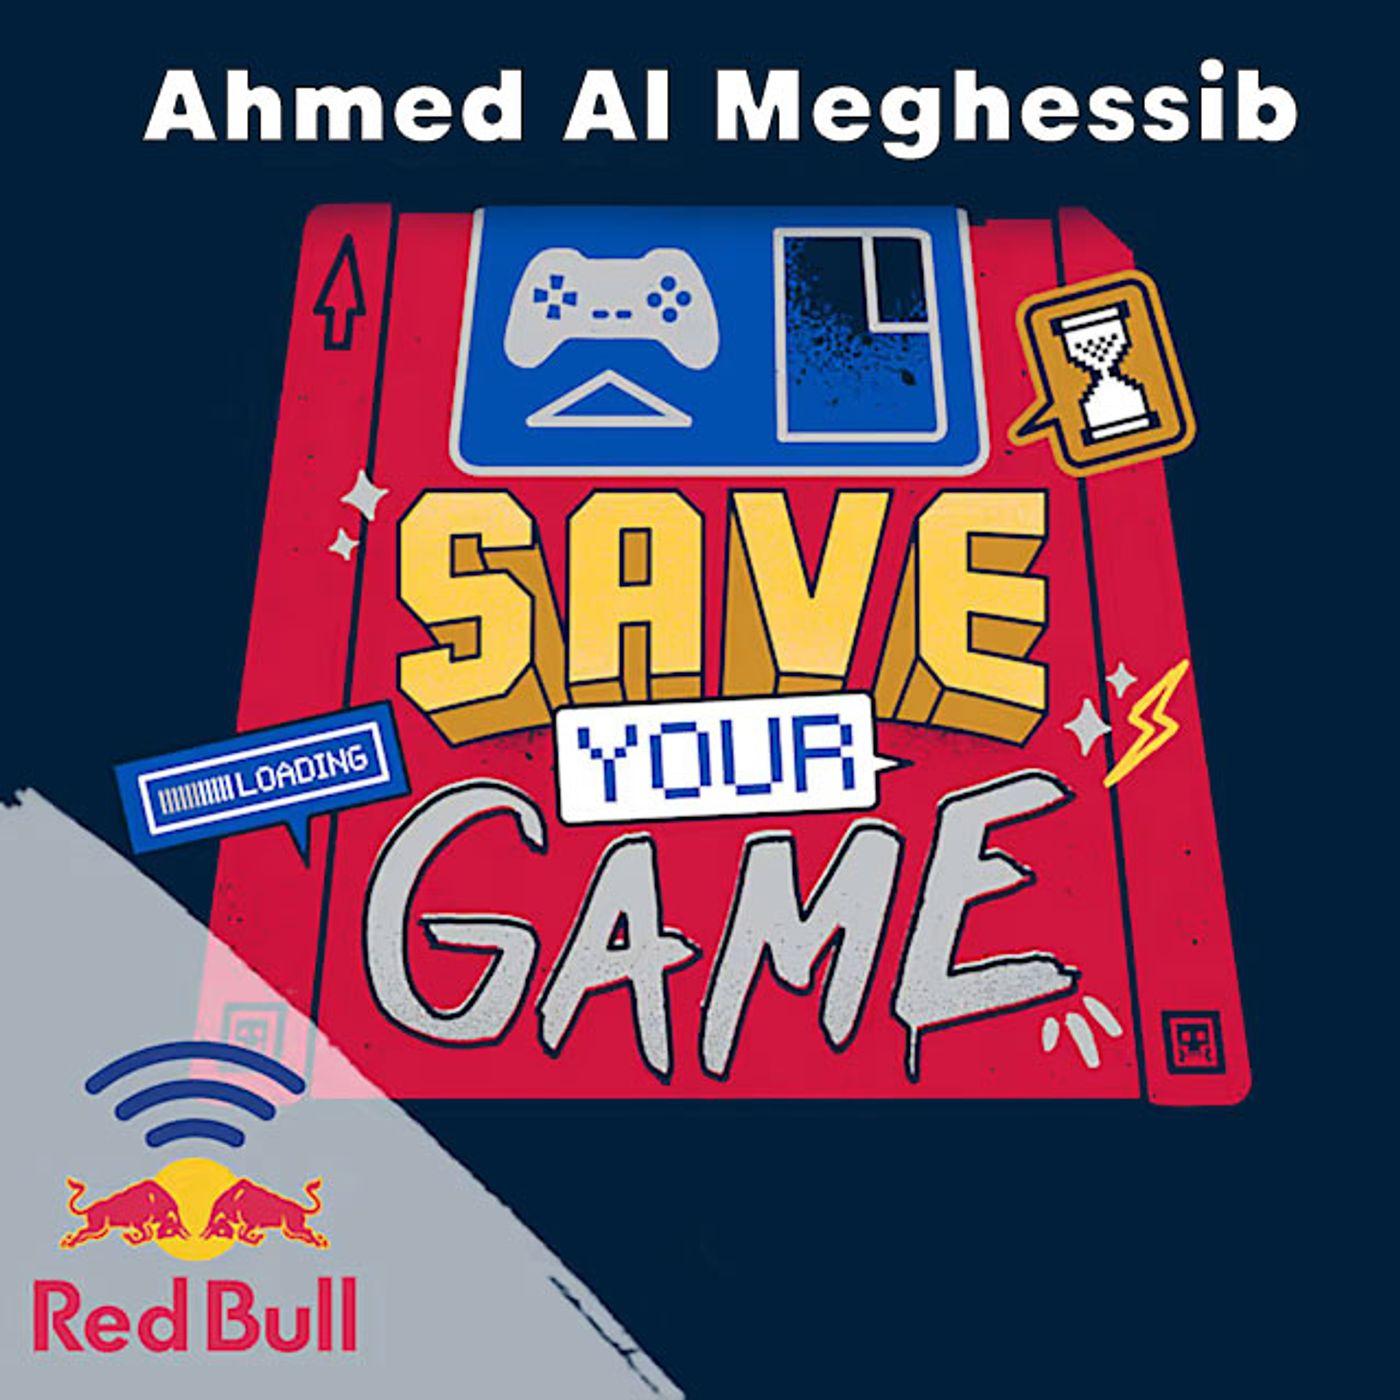 FIFA with PSG esports pro Ahmed Al Meghessib